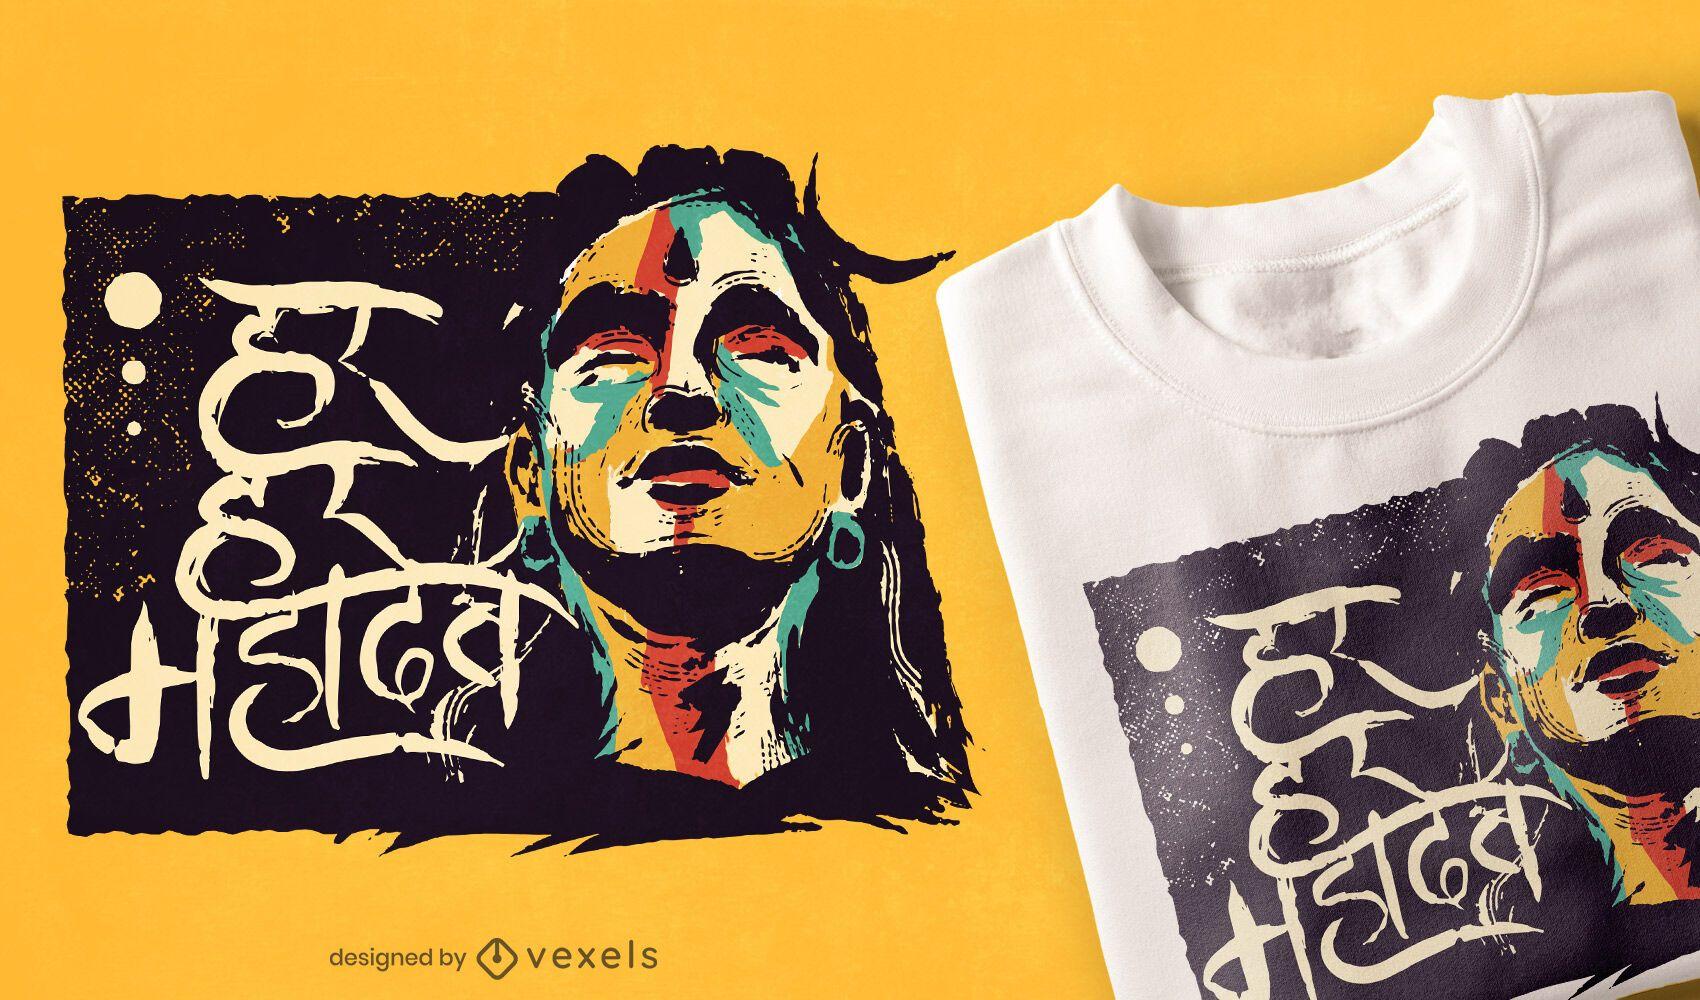 Shiva hindu god culture t-shirt design